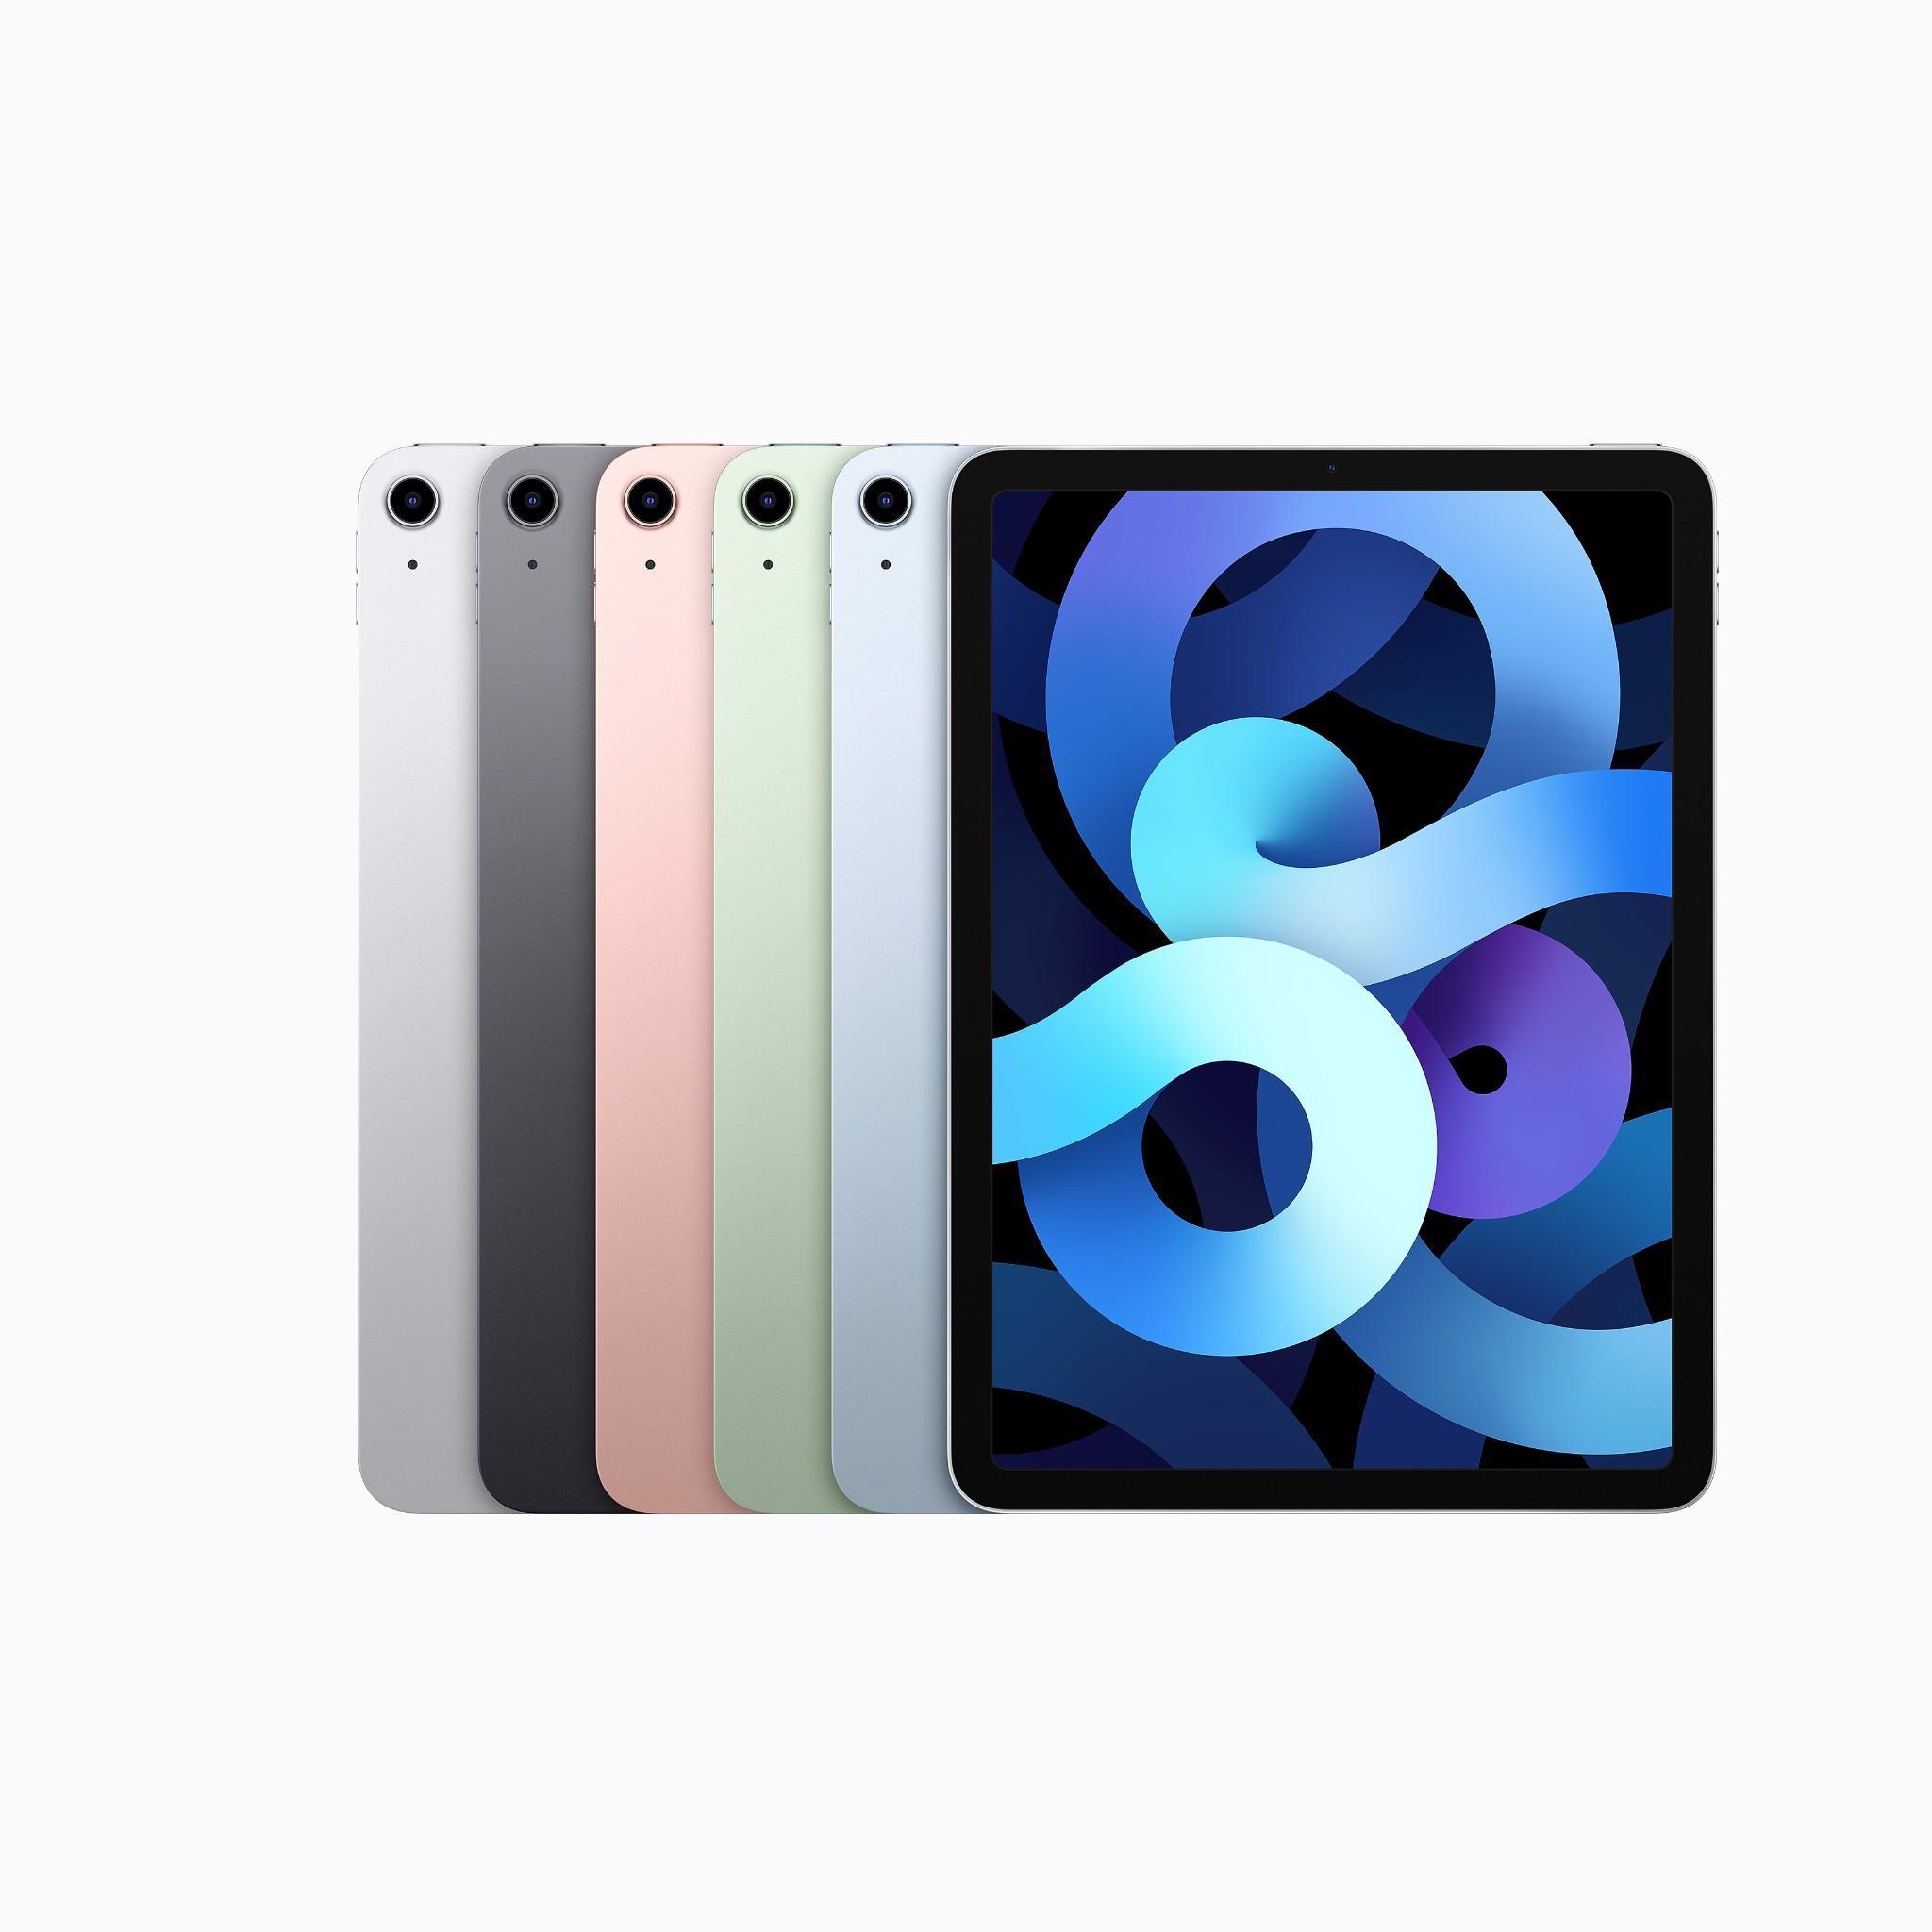 iPad Air 4 (2020) 4G 64GB